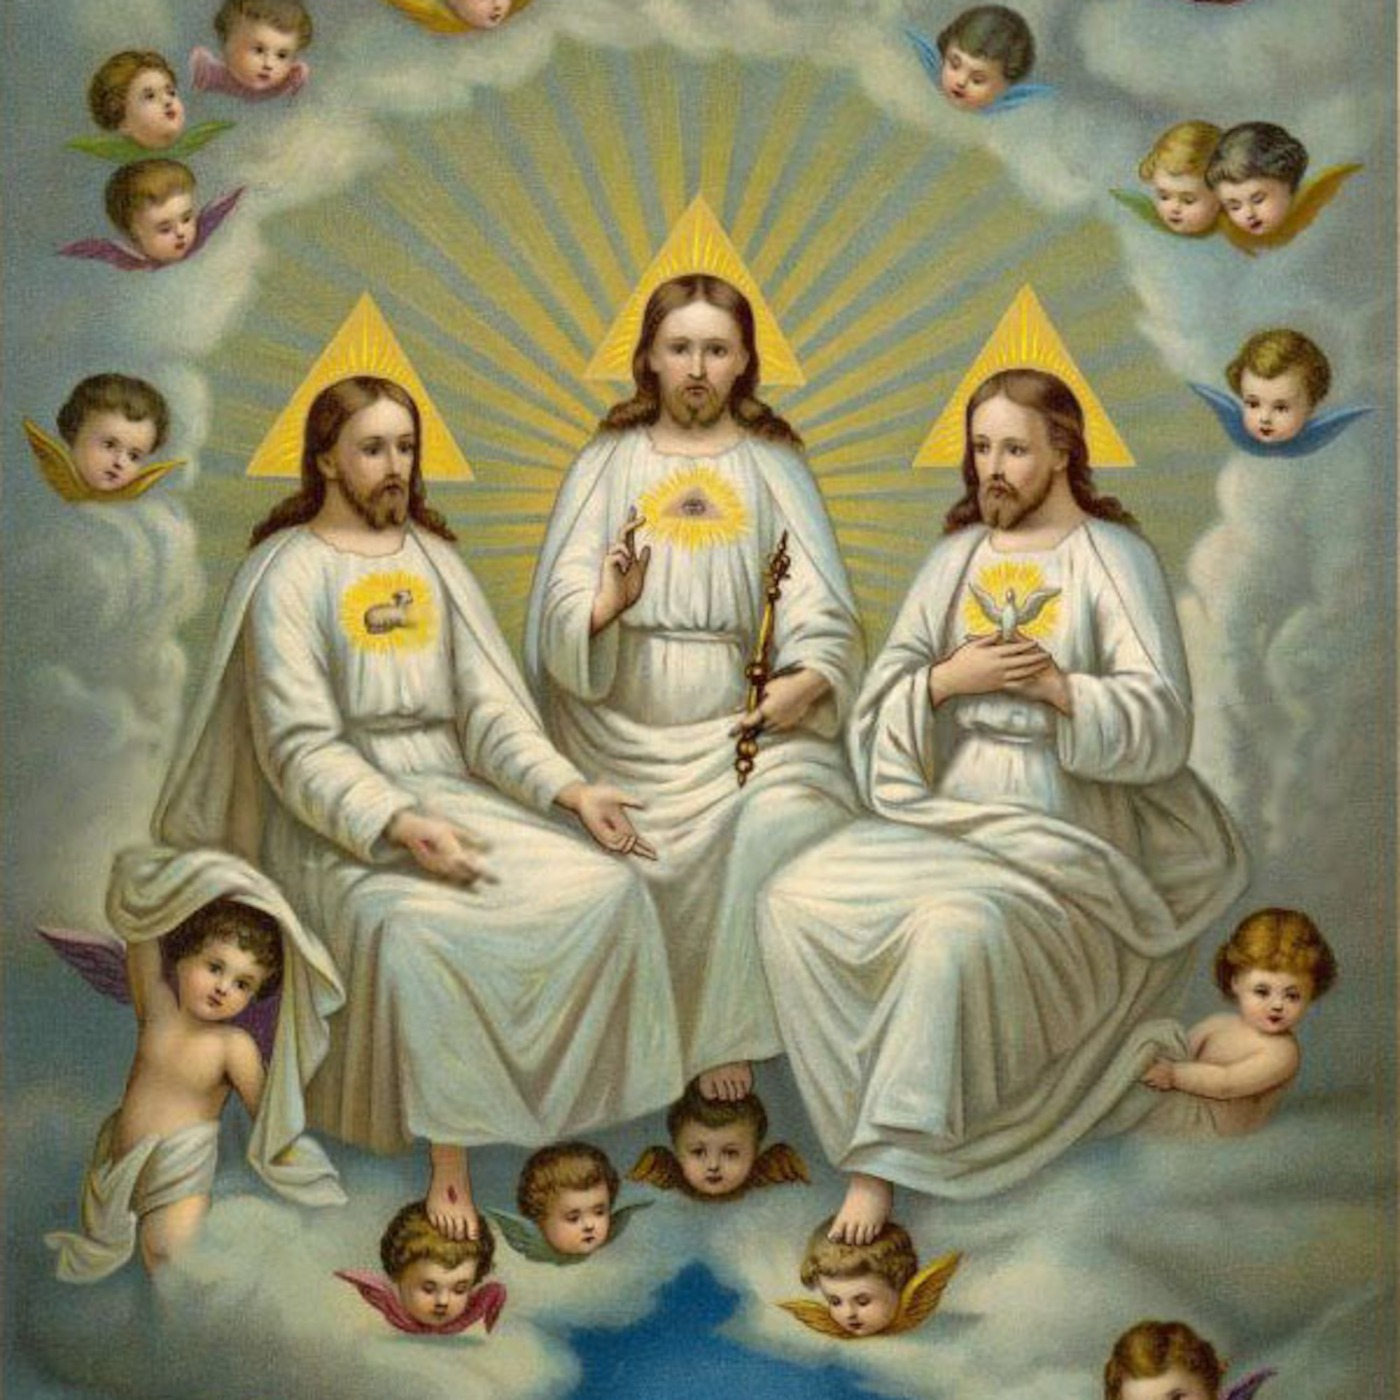 Секс фото не святая троица 6 фотография